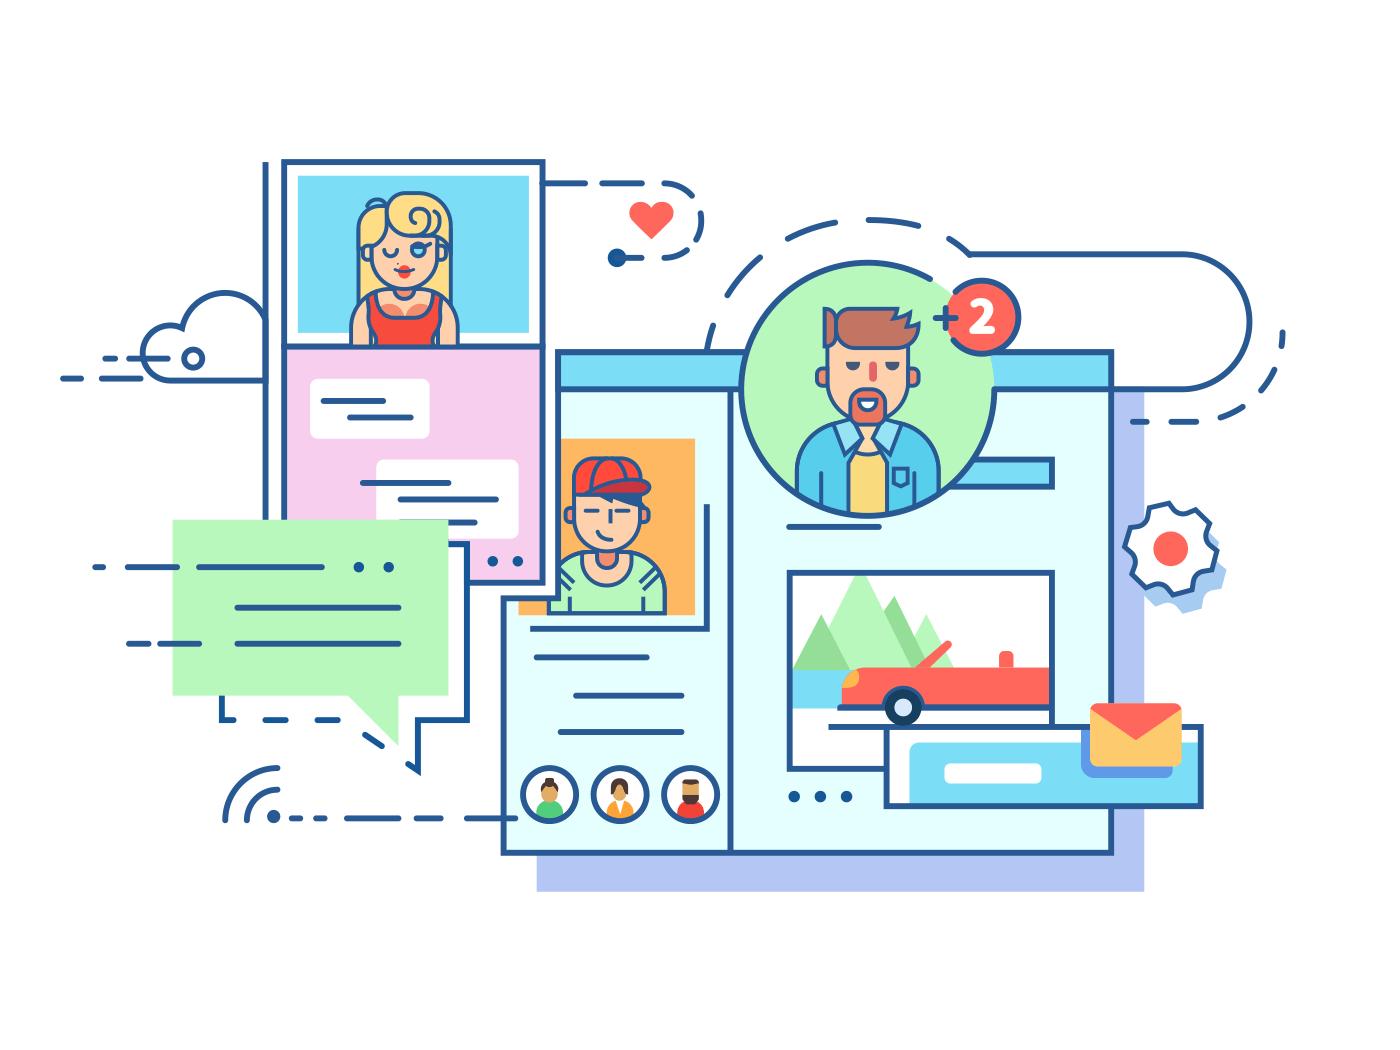 Social communication network line vector illustration